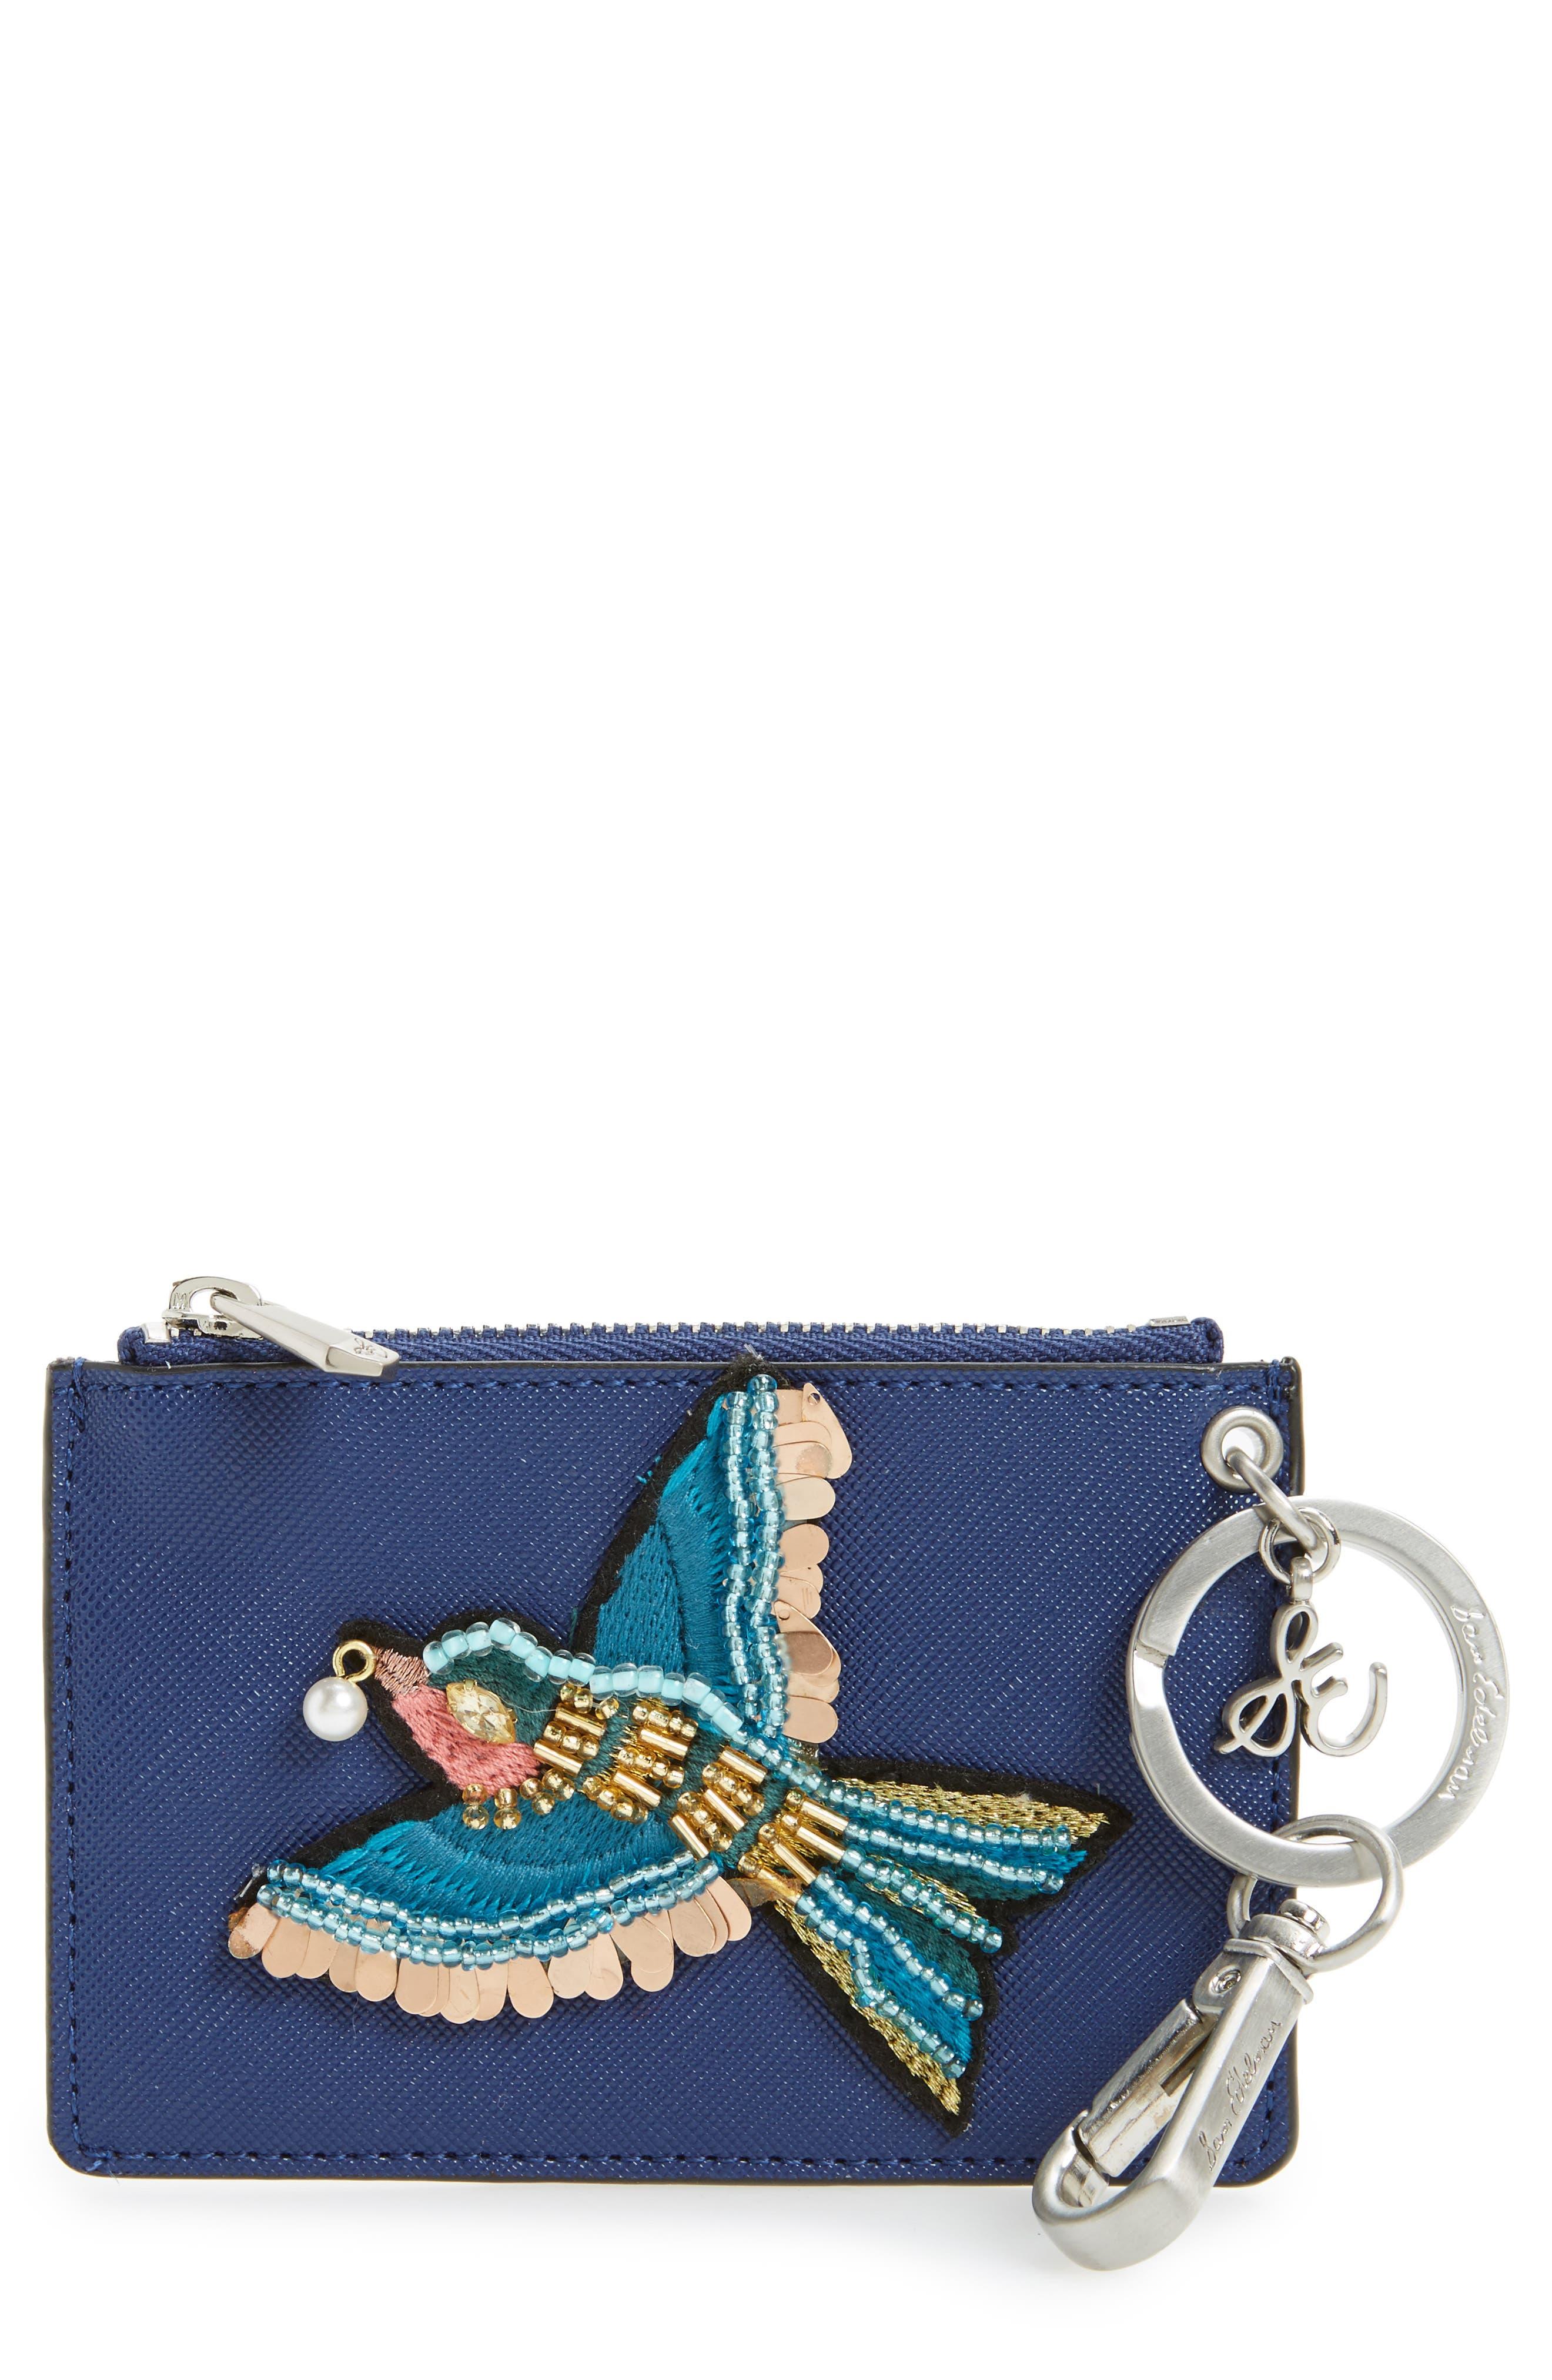 Carter Bird Embellished Faux Leather Card Case,                             Main thumbnail 1, color,                             Poseidon Blue